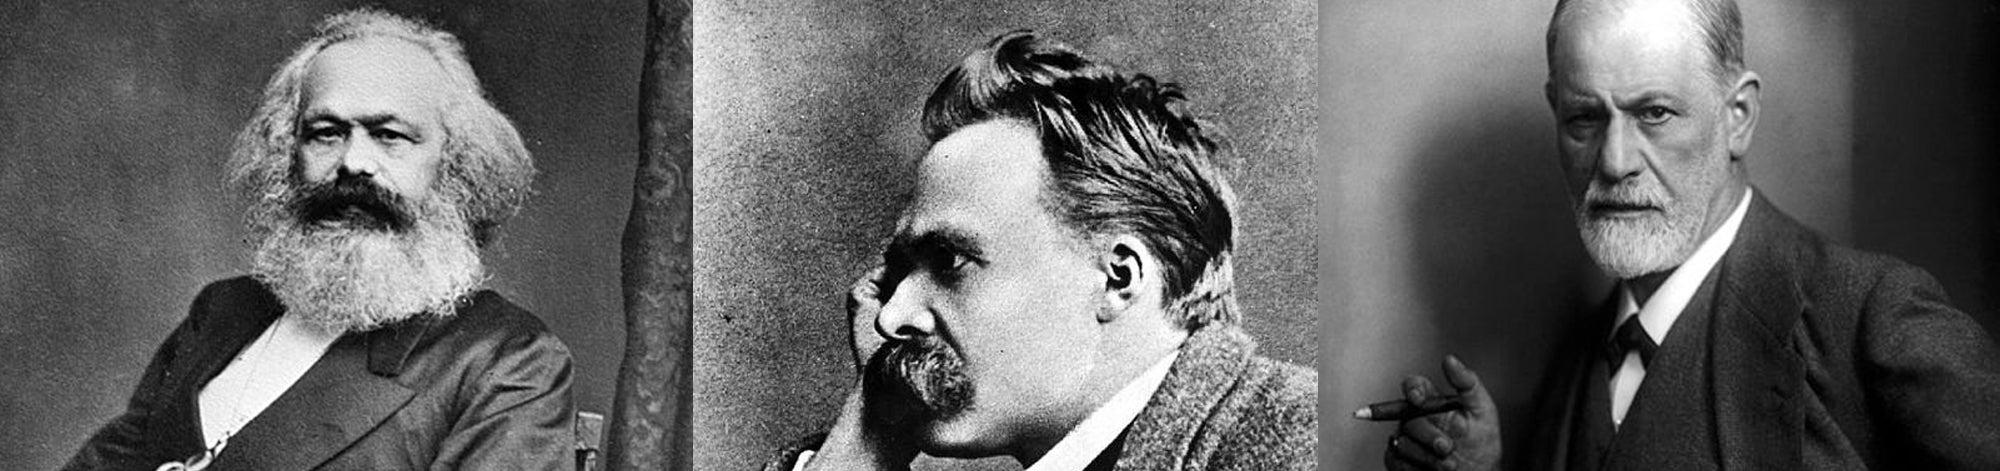 Marx, Nietzsche and Freud Banner